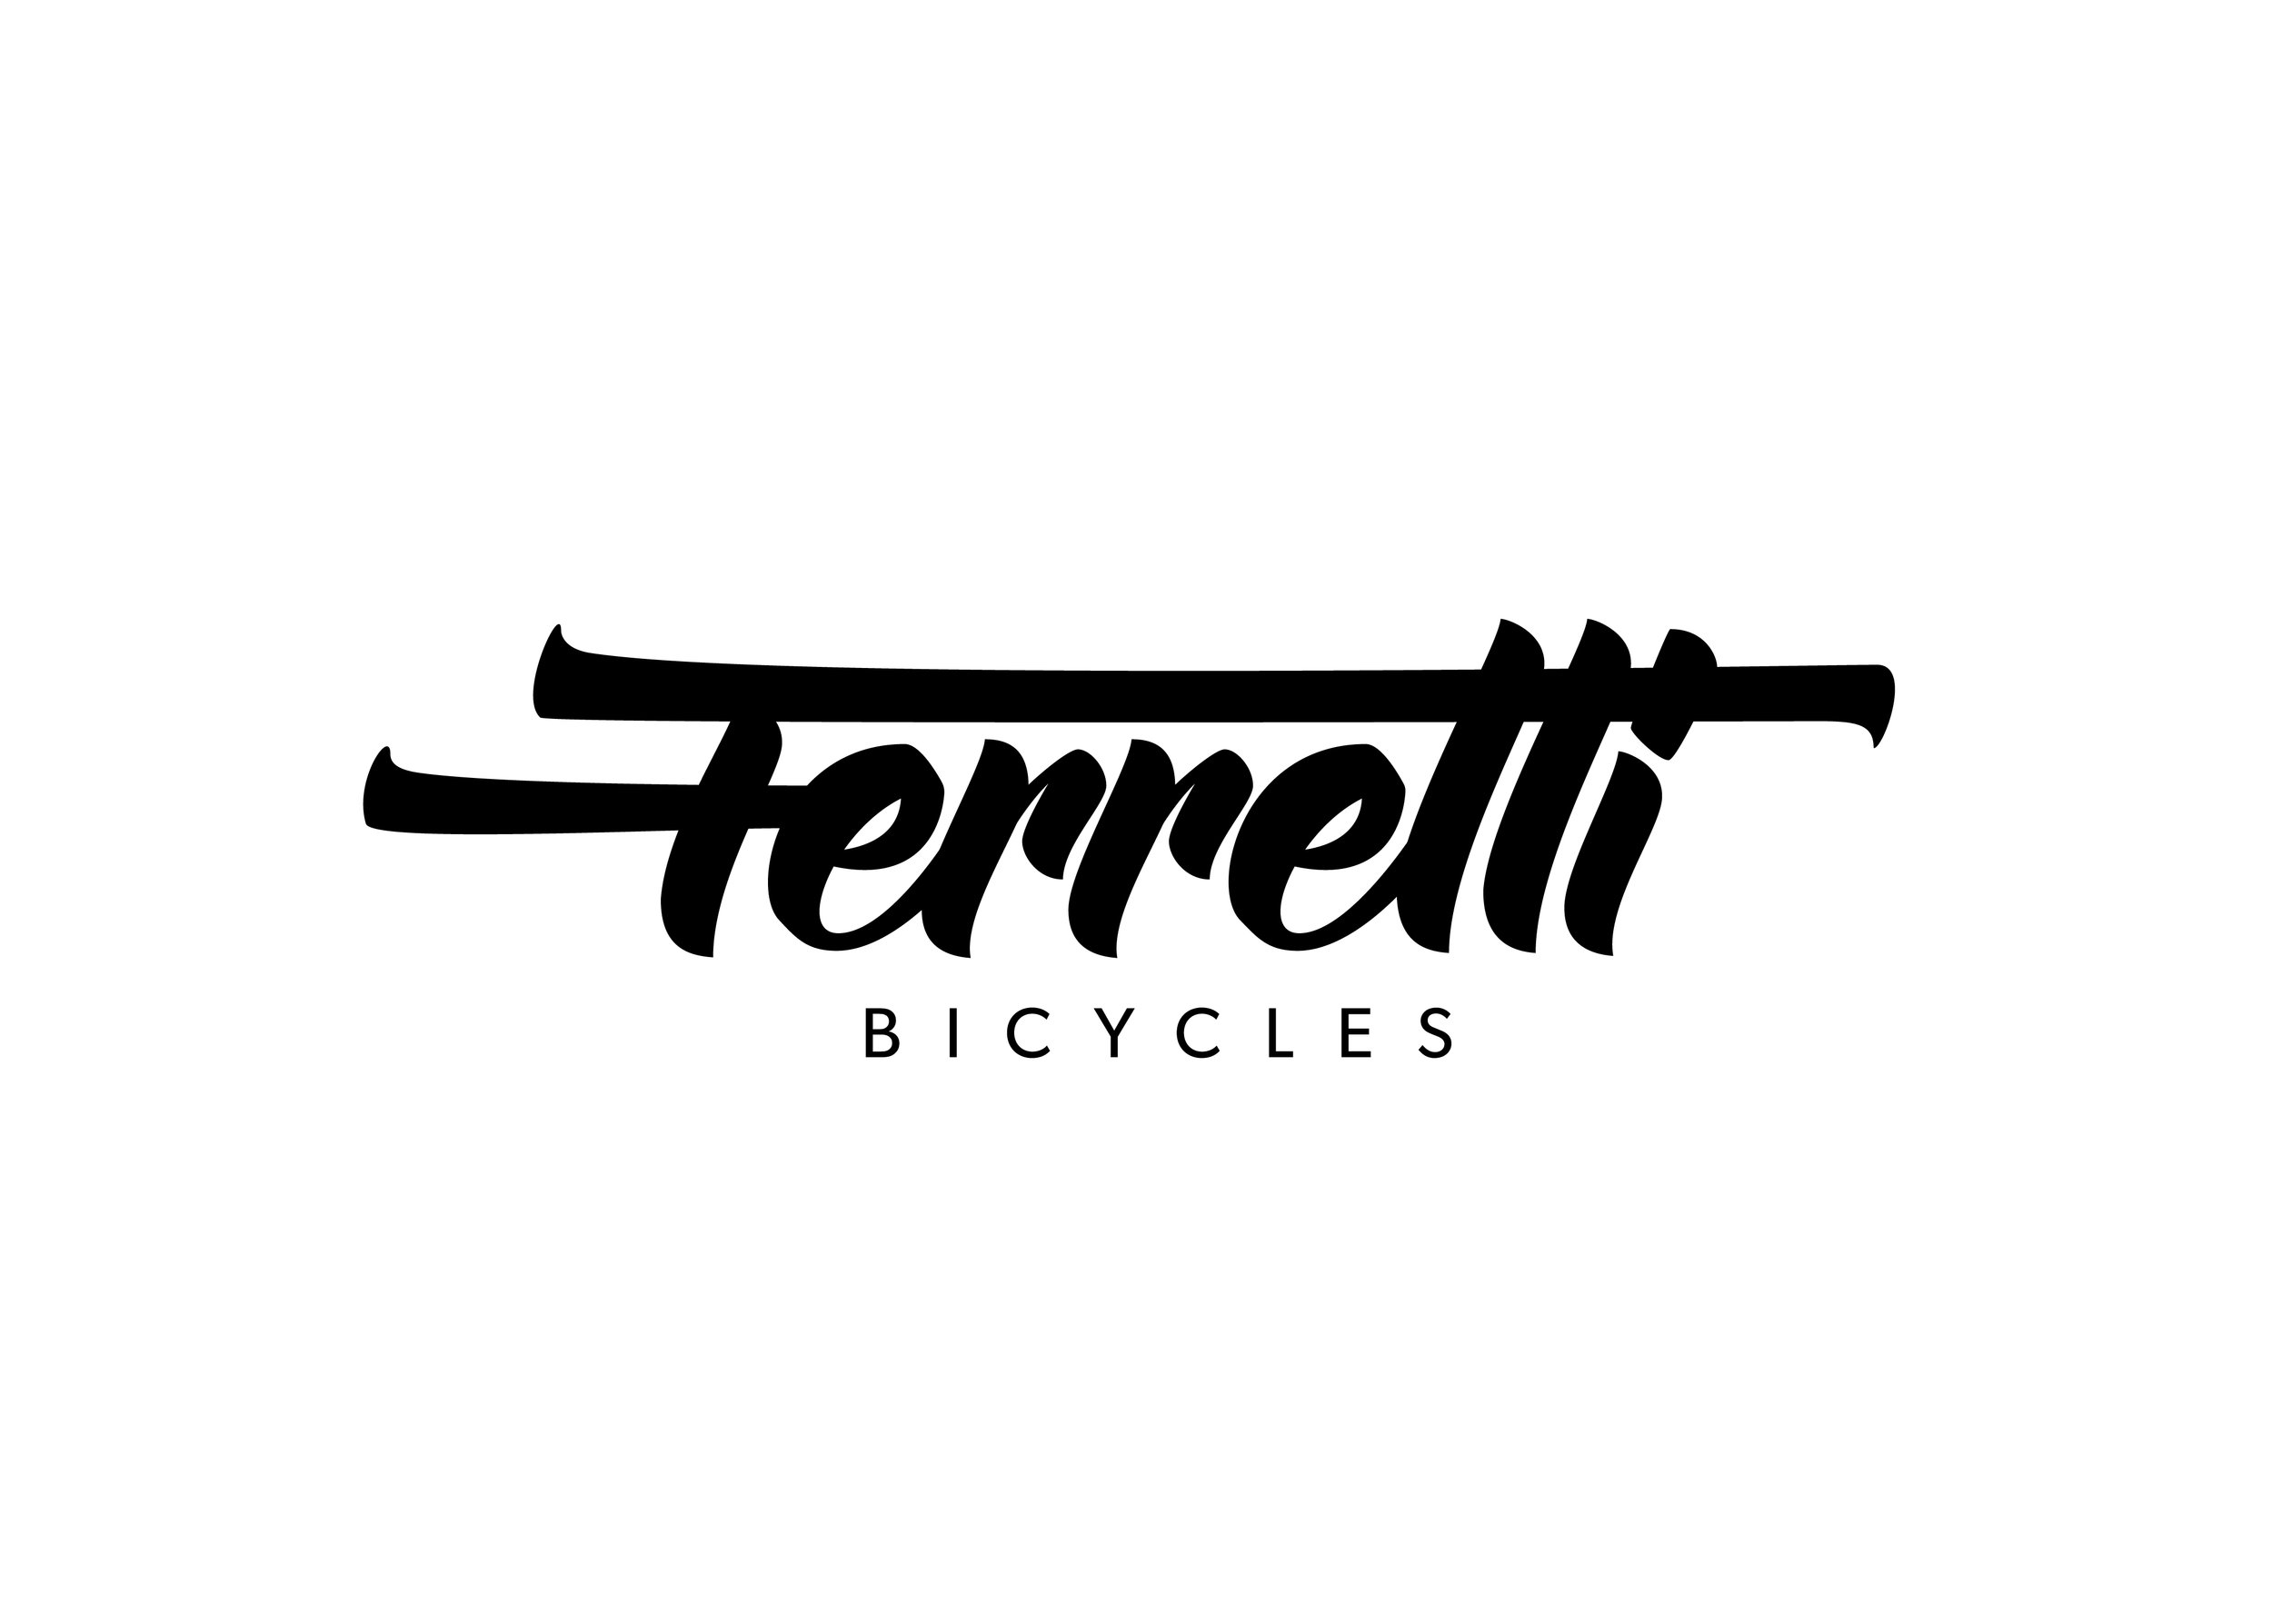 Ferretti Logotype